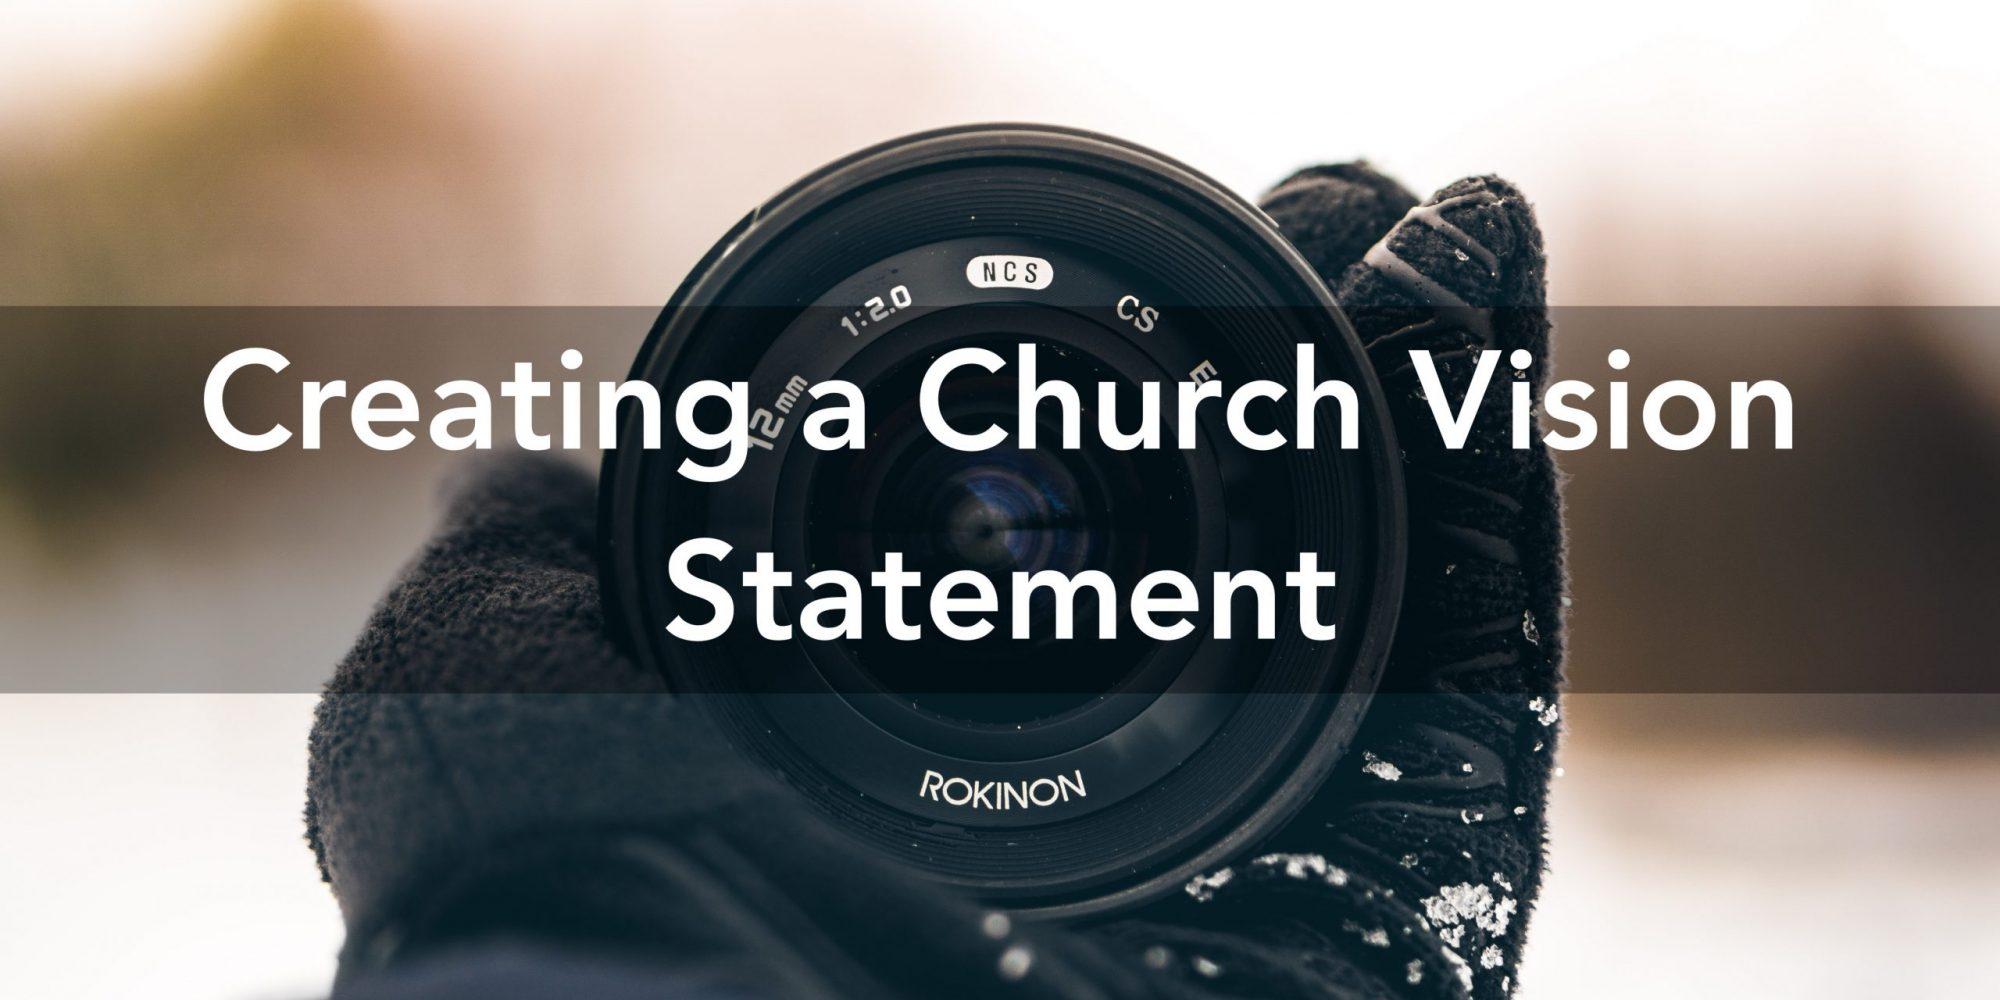 Creating a Church Vision Statement